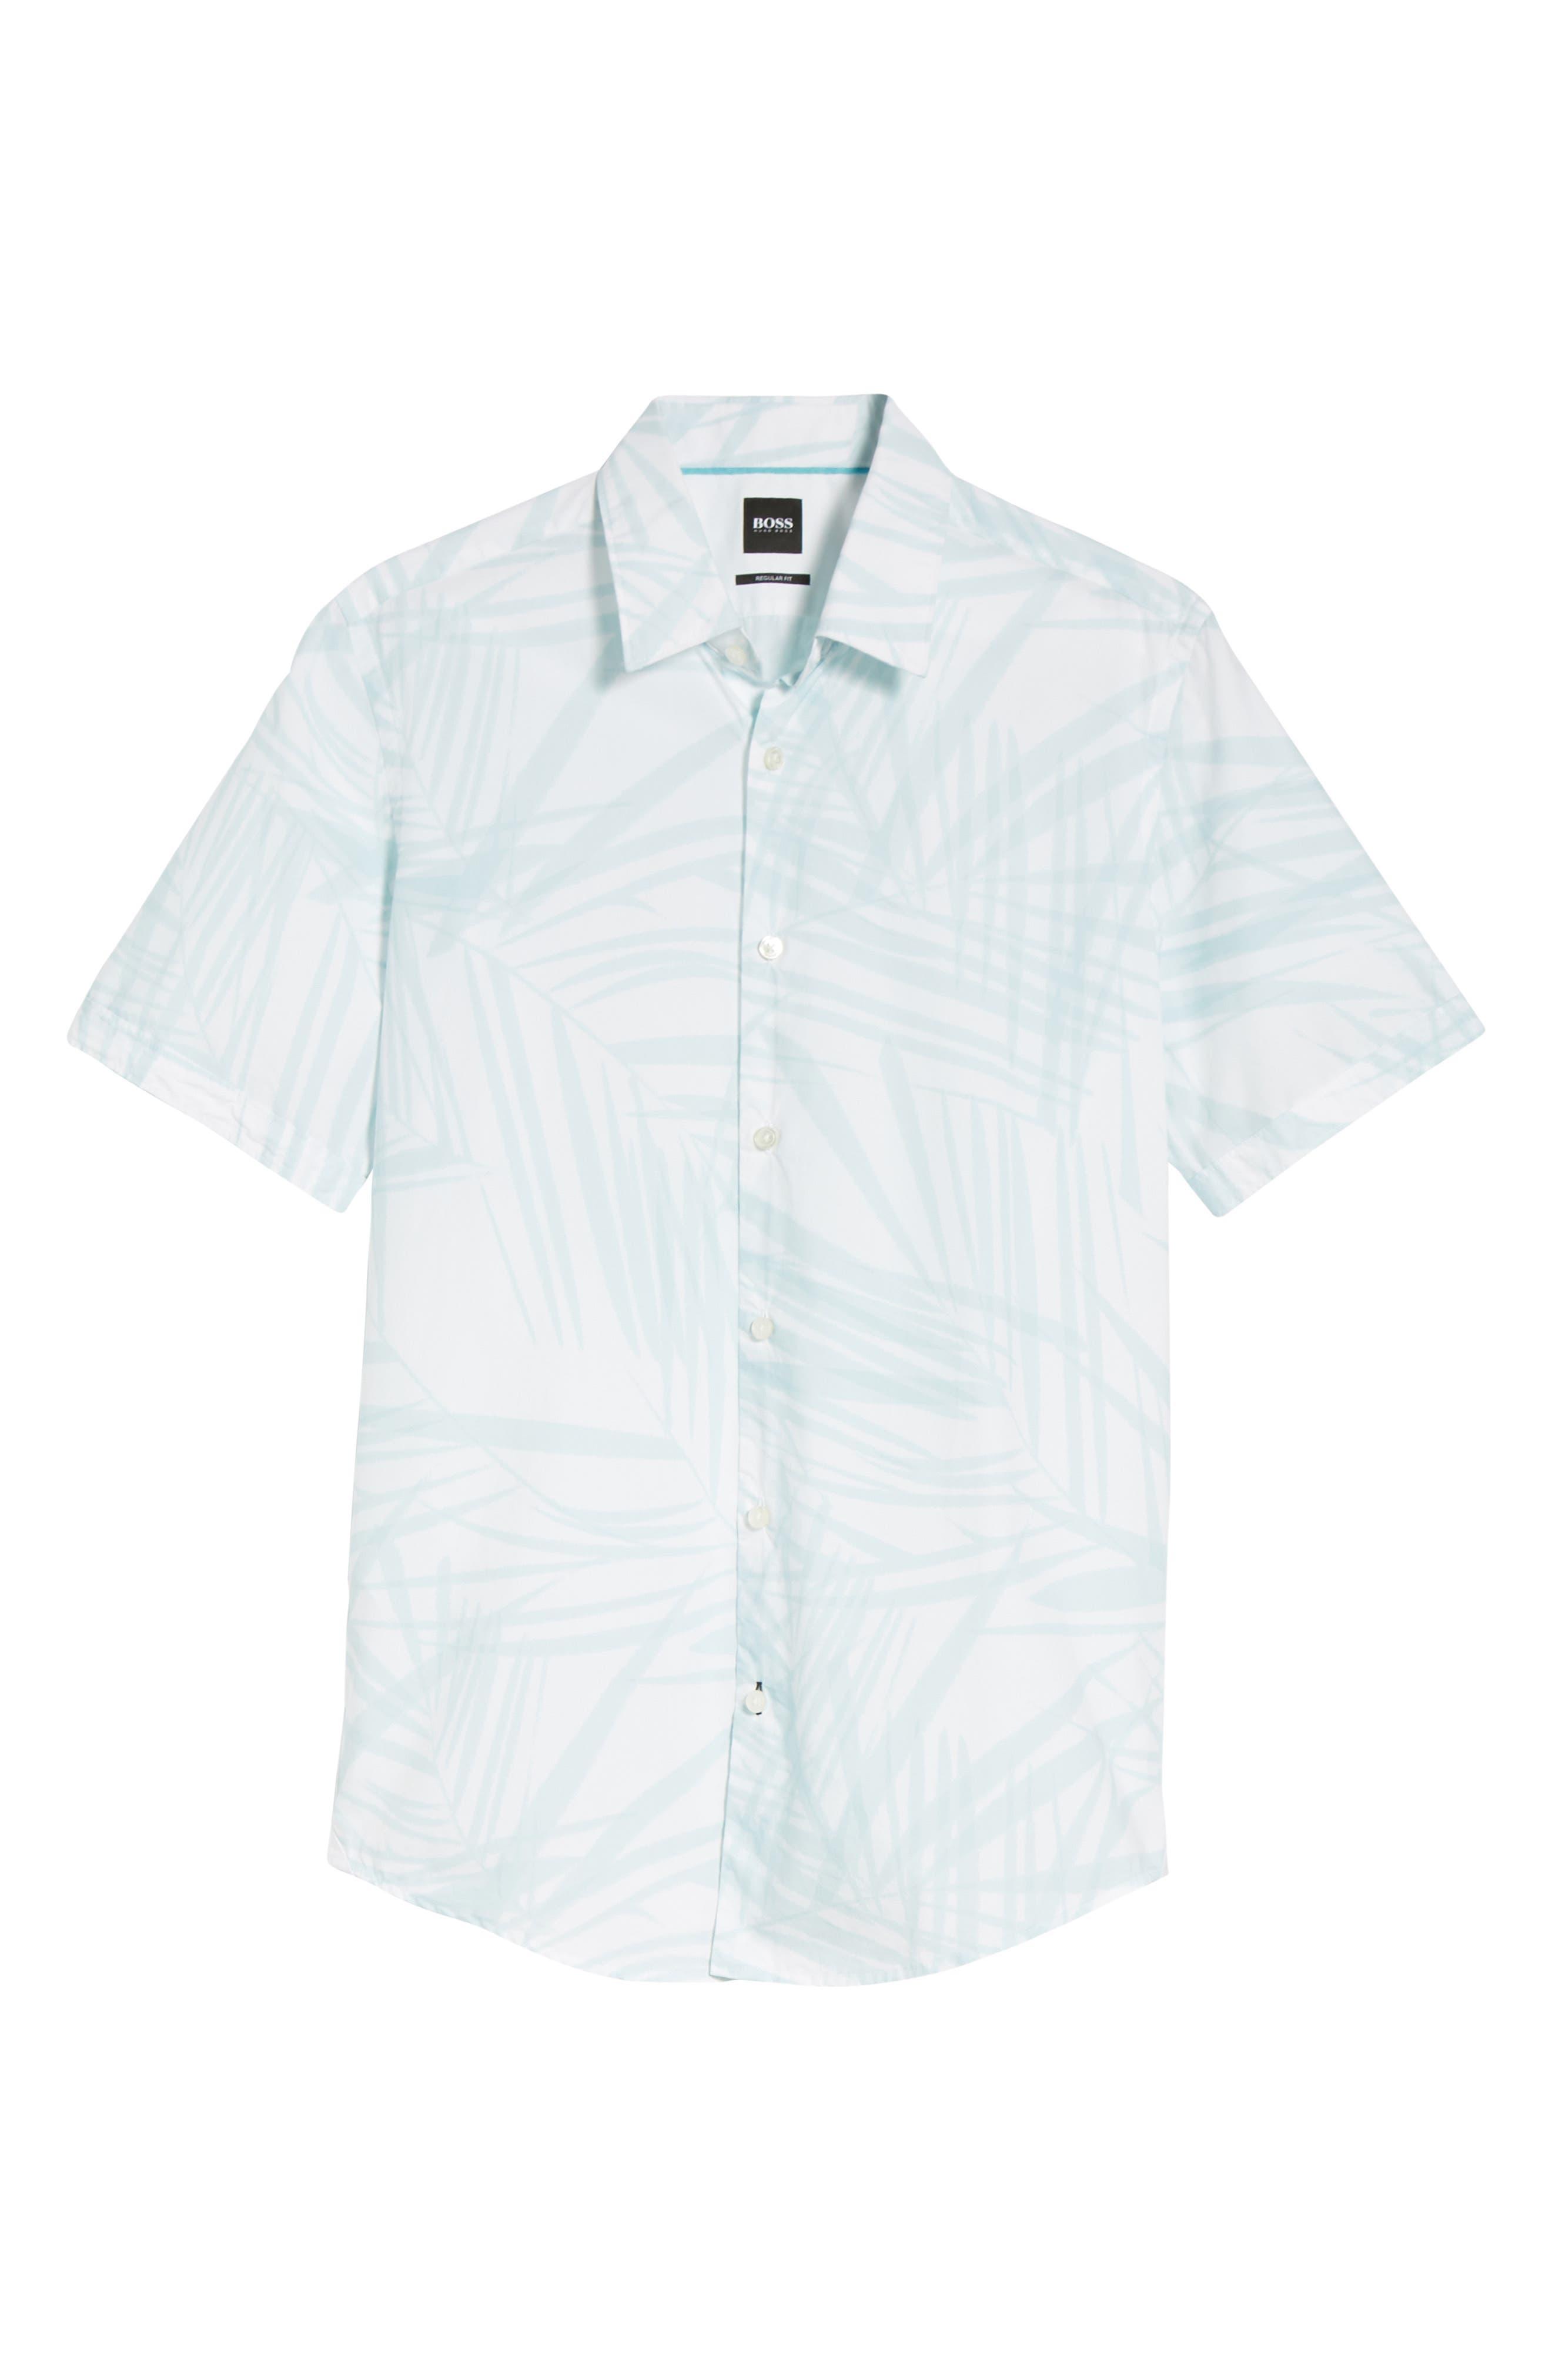 Luka Regular Fit Short Sleeve Sport Shirt,                             Alternate thumbnail 6, color,                             456